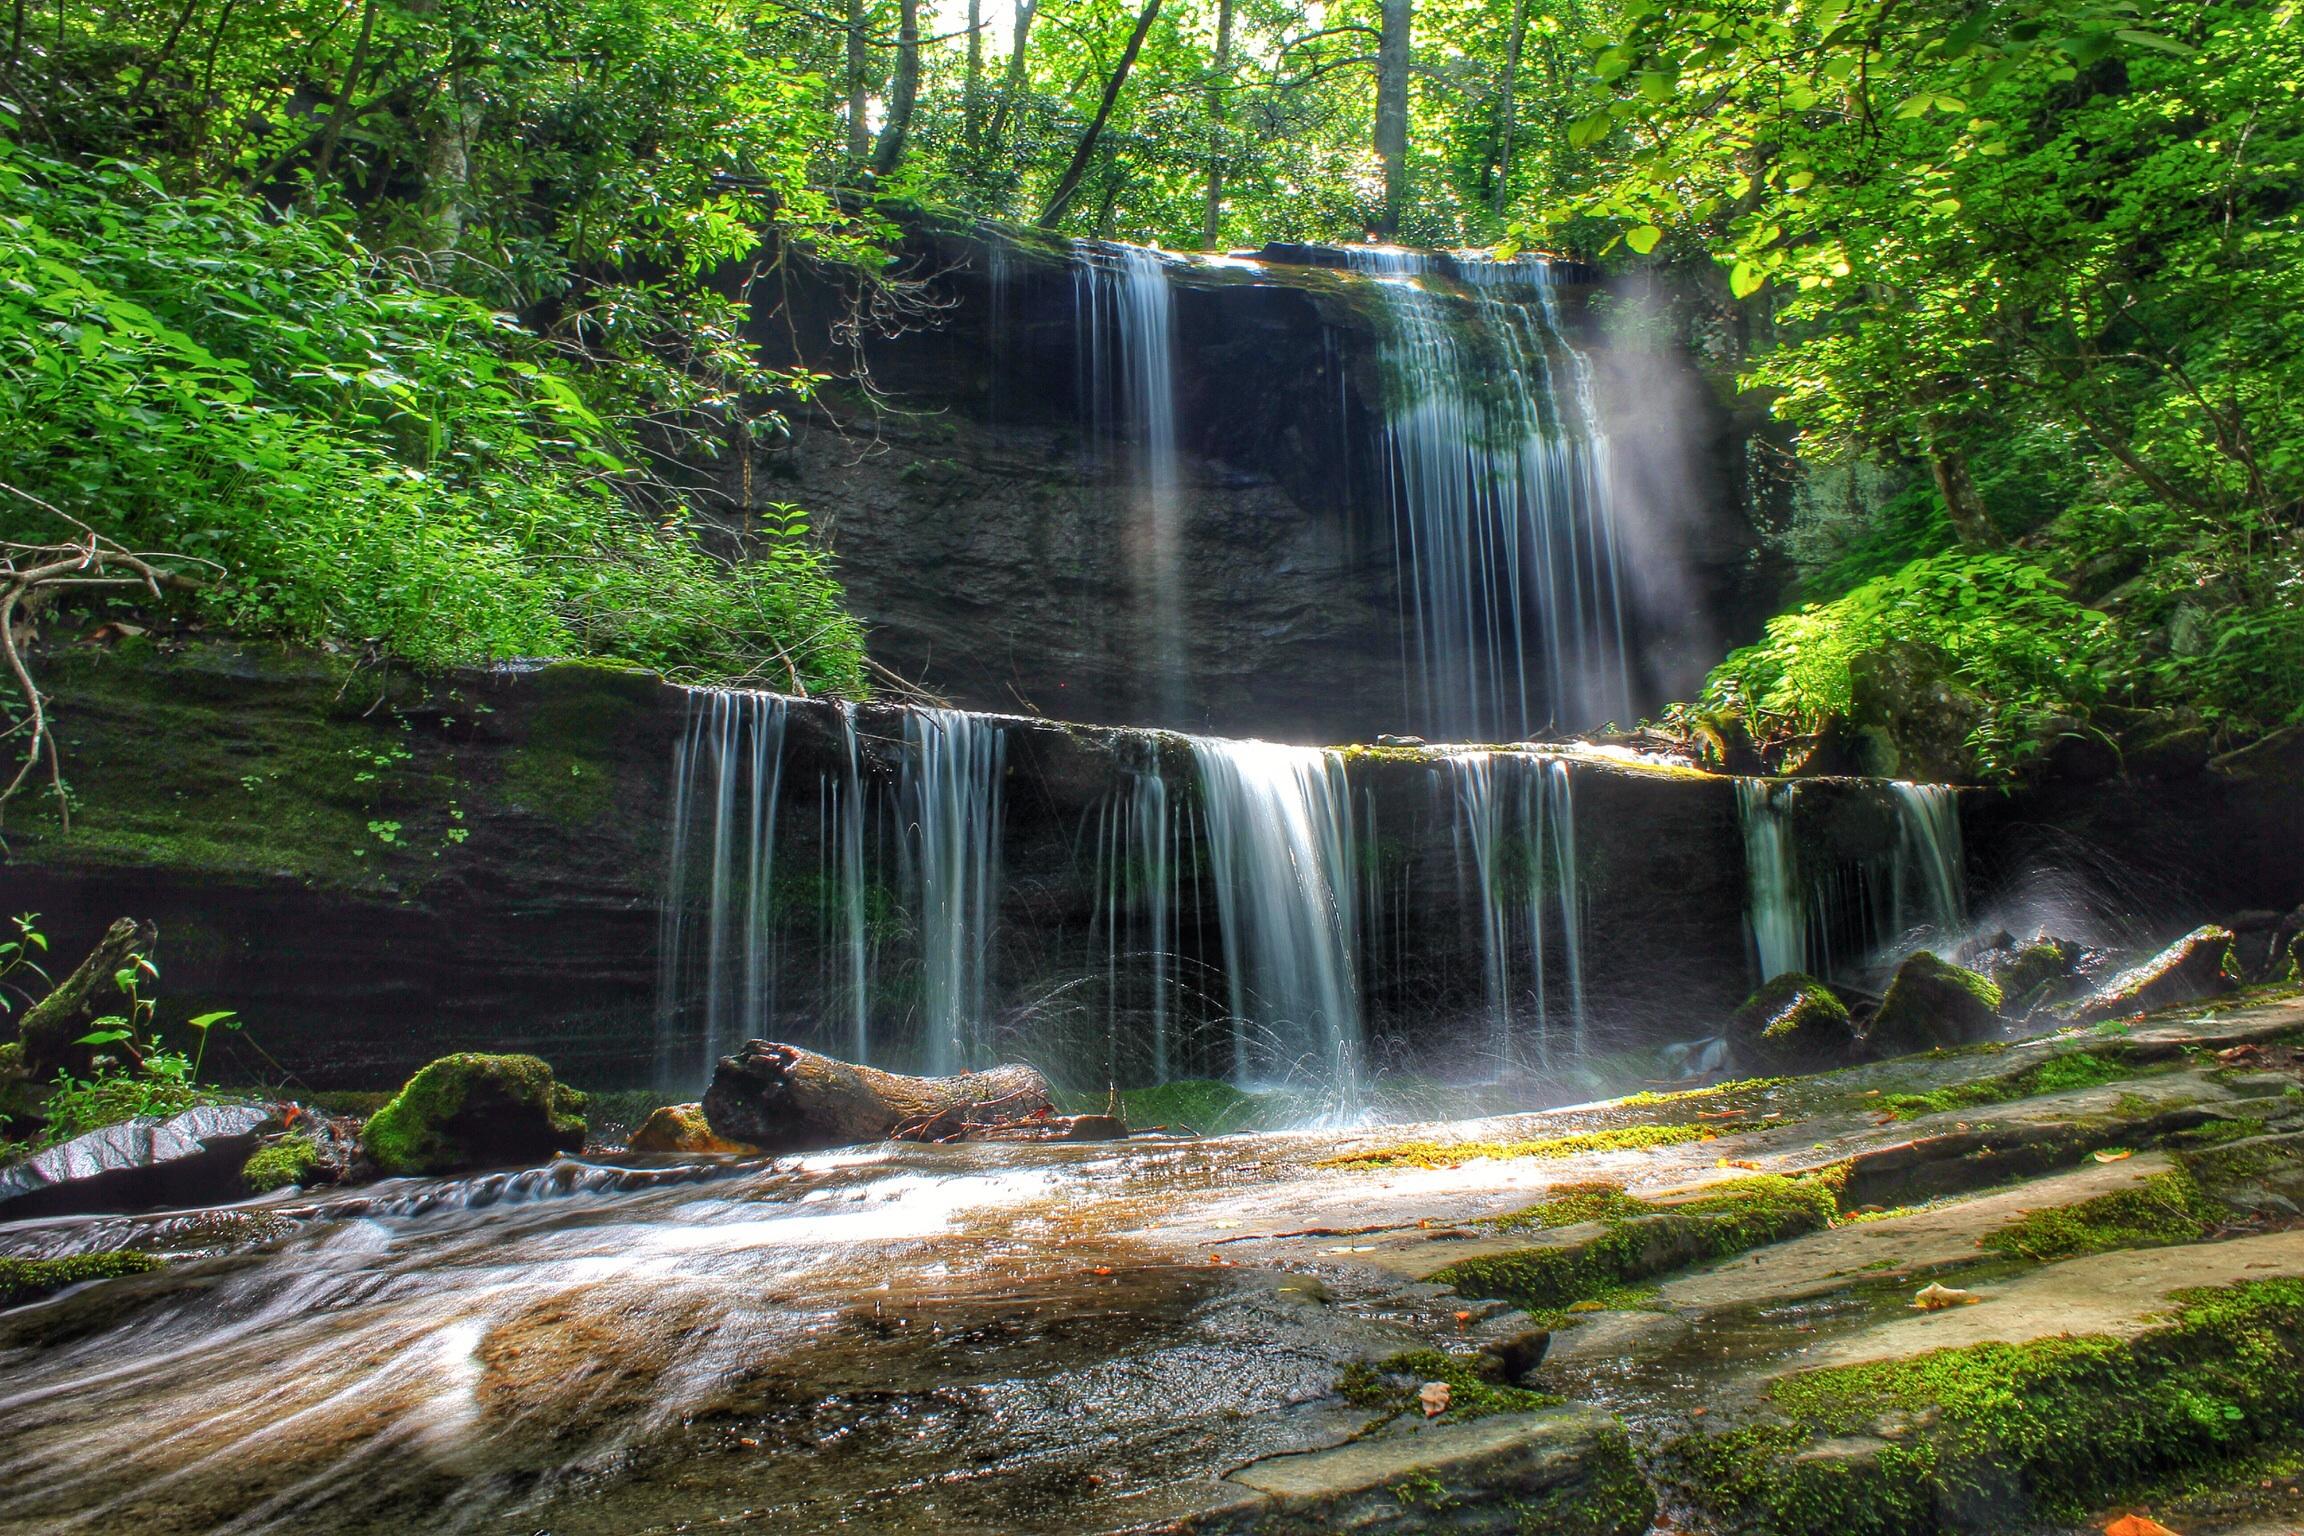 grassy creek Grassy creek falls is a waterfall along the blue ridge parkway in little switzerland, north carolina.